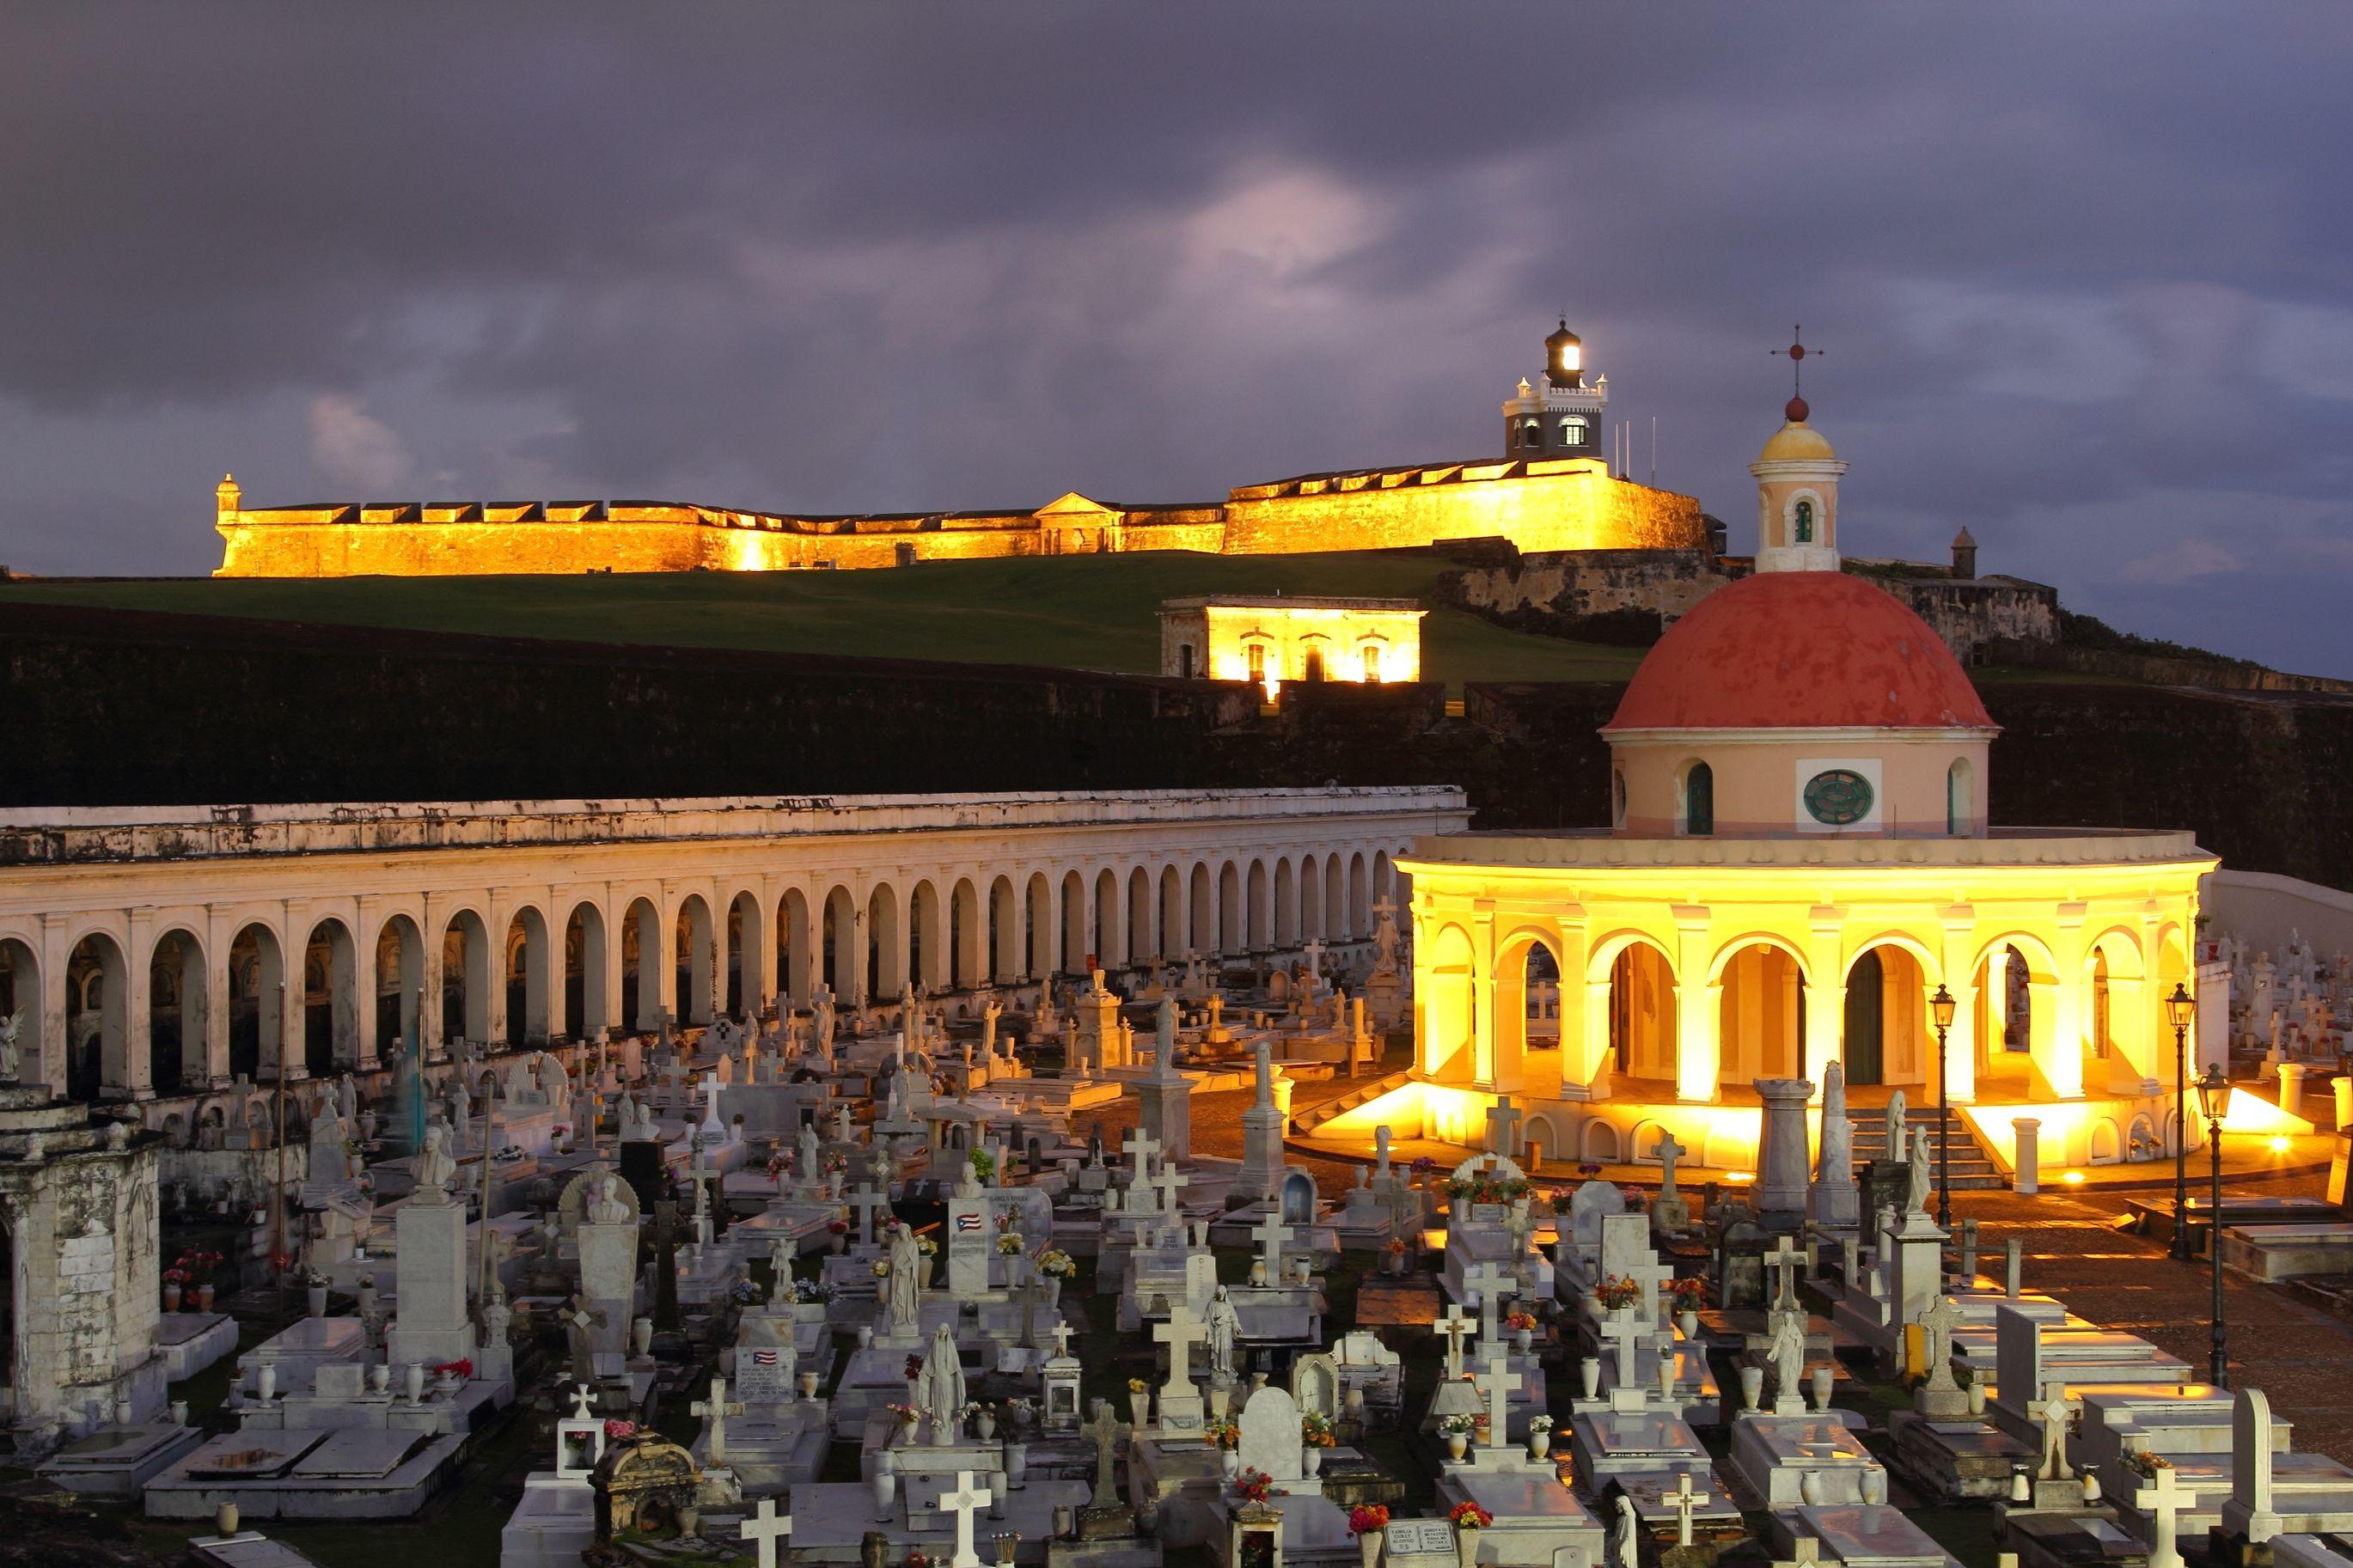 Castillo San Felipe del Morro and Santa Maria Magdalena